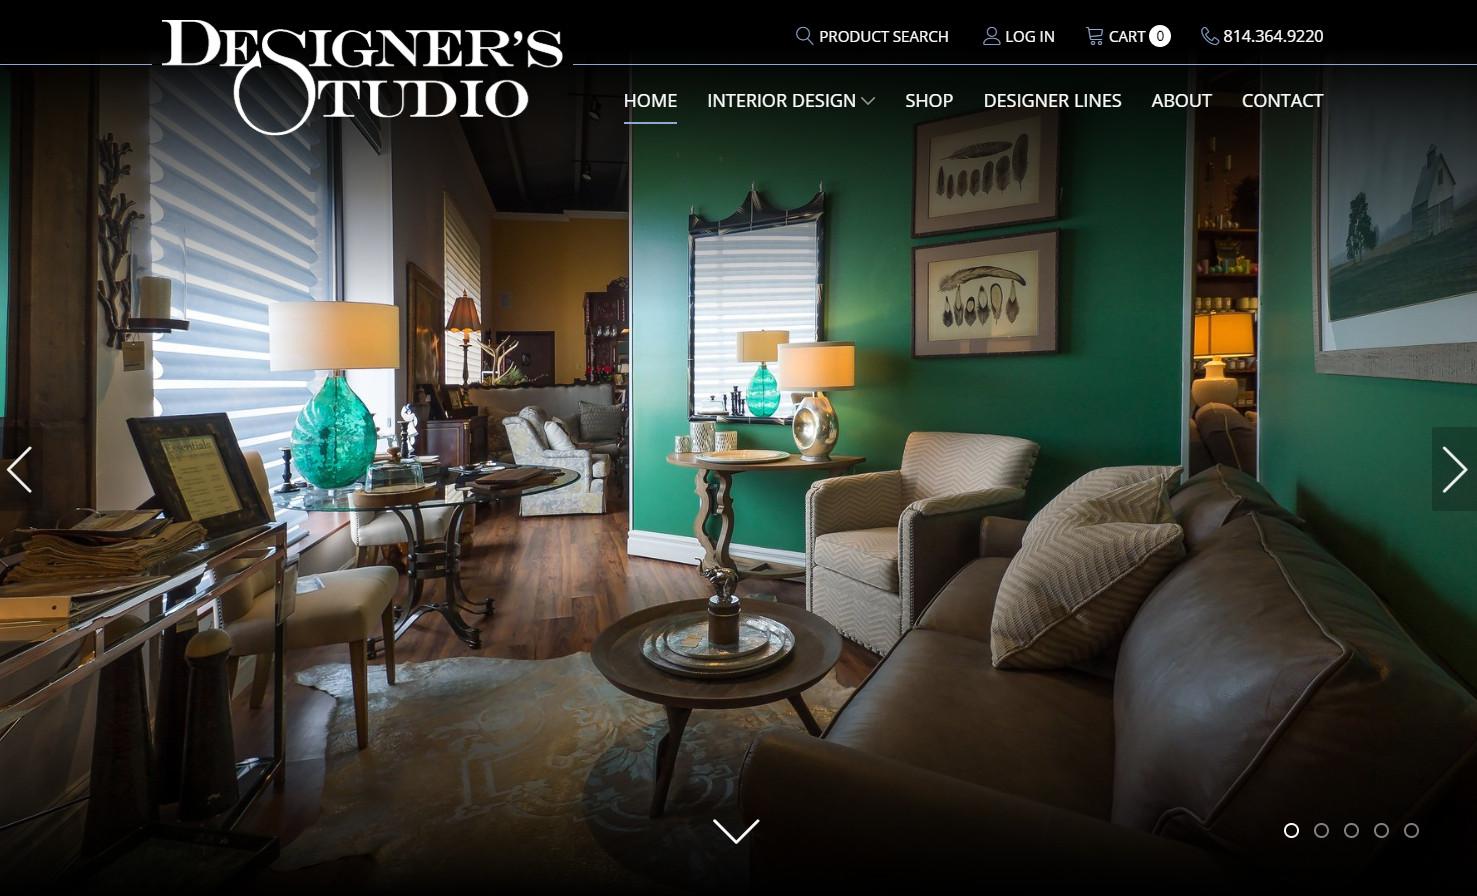 Designer's Studio green room